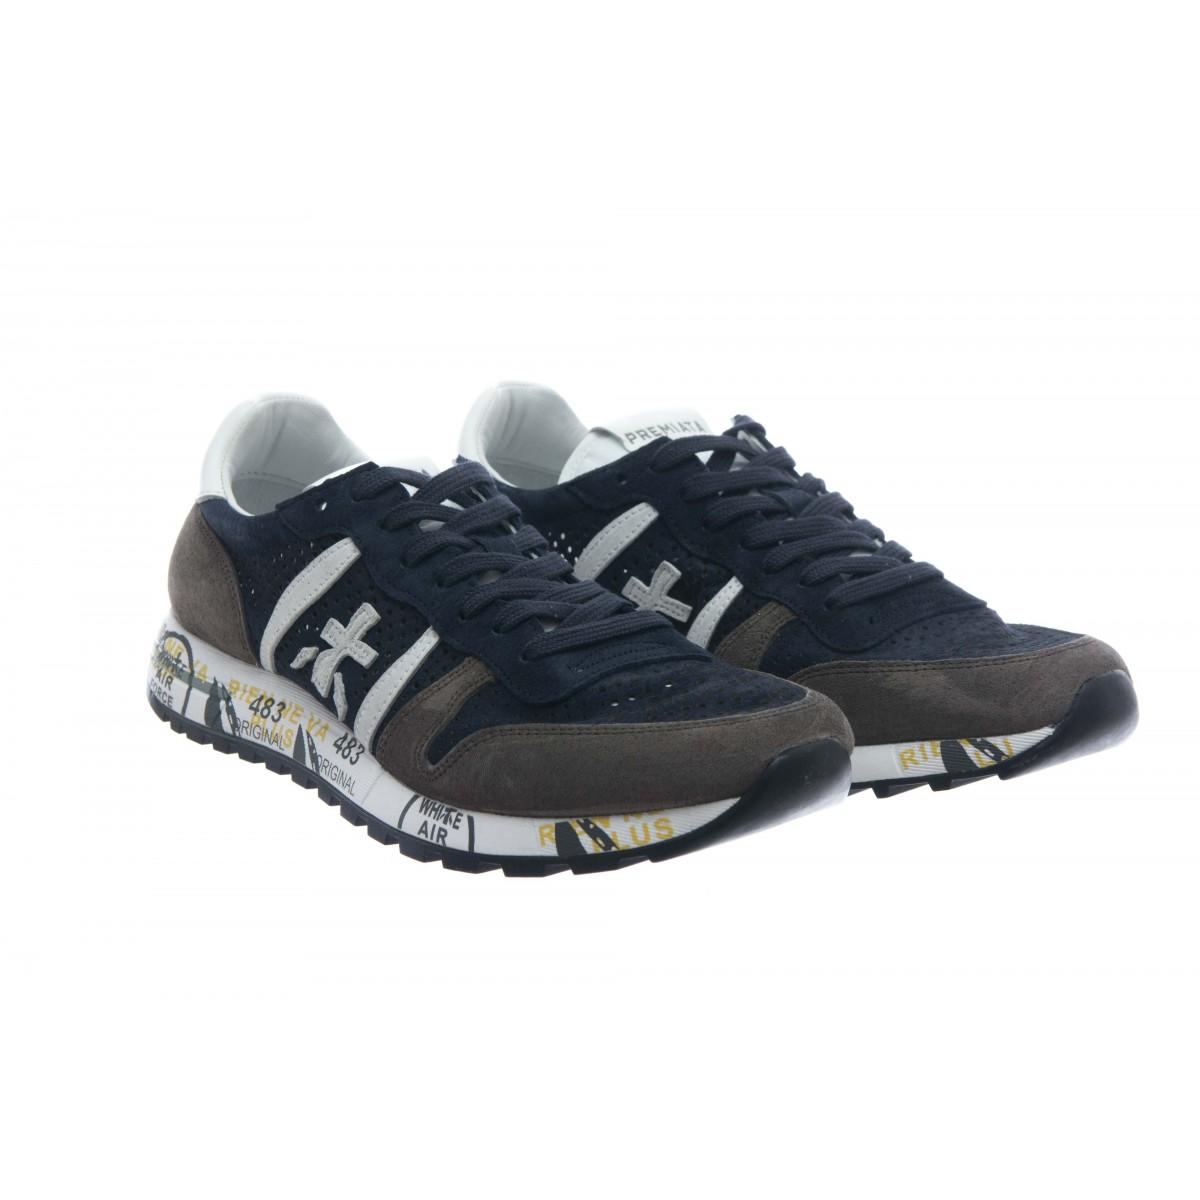 Scarpe - Eric 2118 sneakers uomo traforata